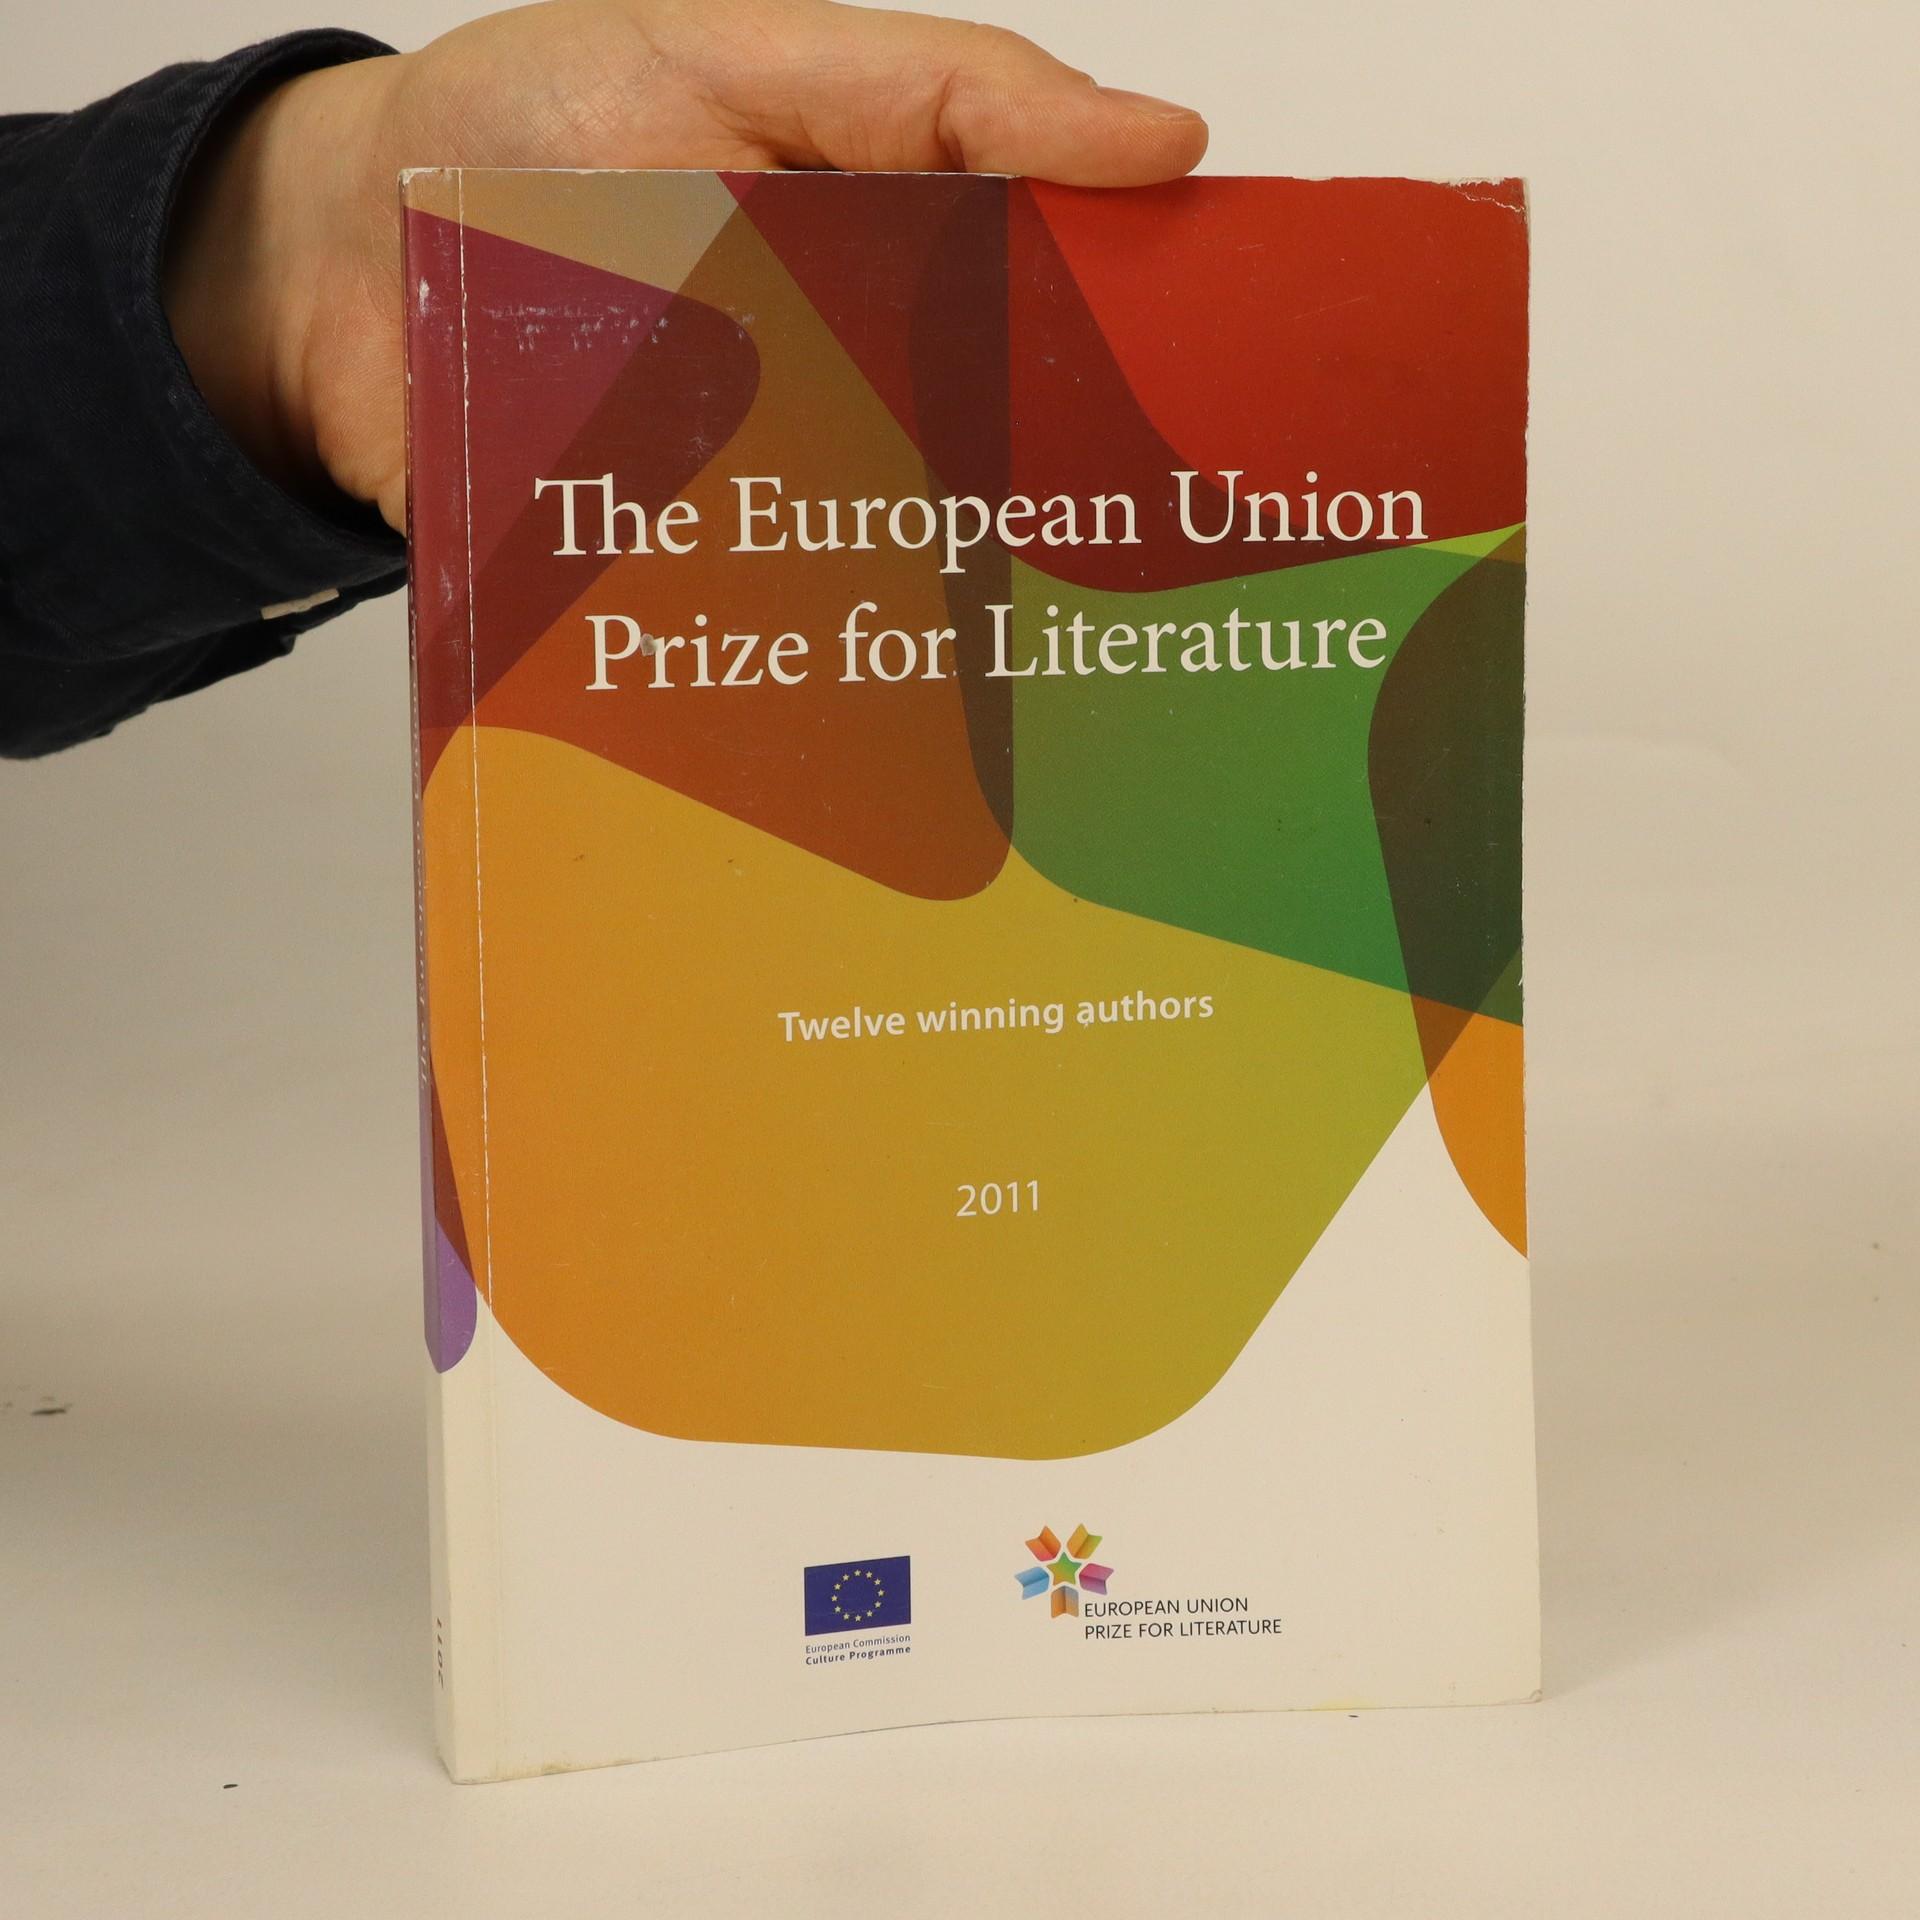 antikvární kniha The European Union Prize for Literature. Twelve winning authors, 2011